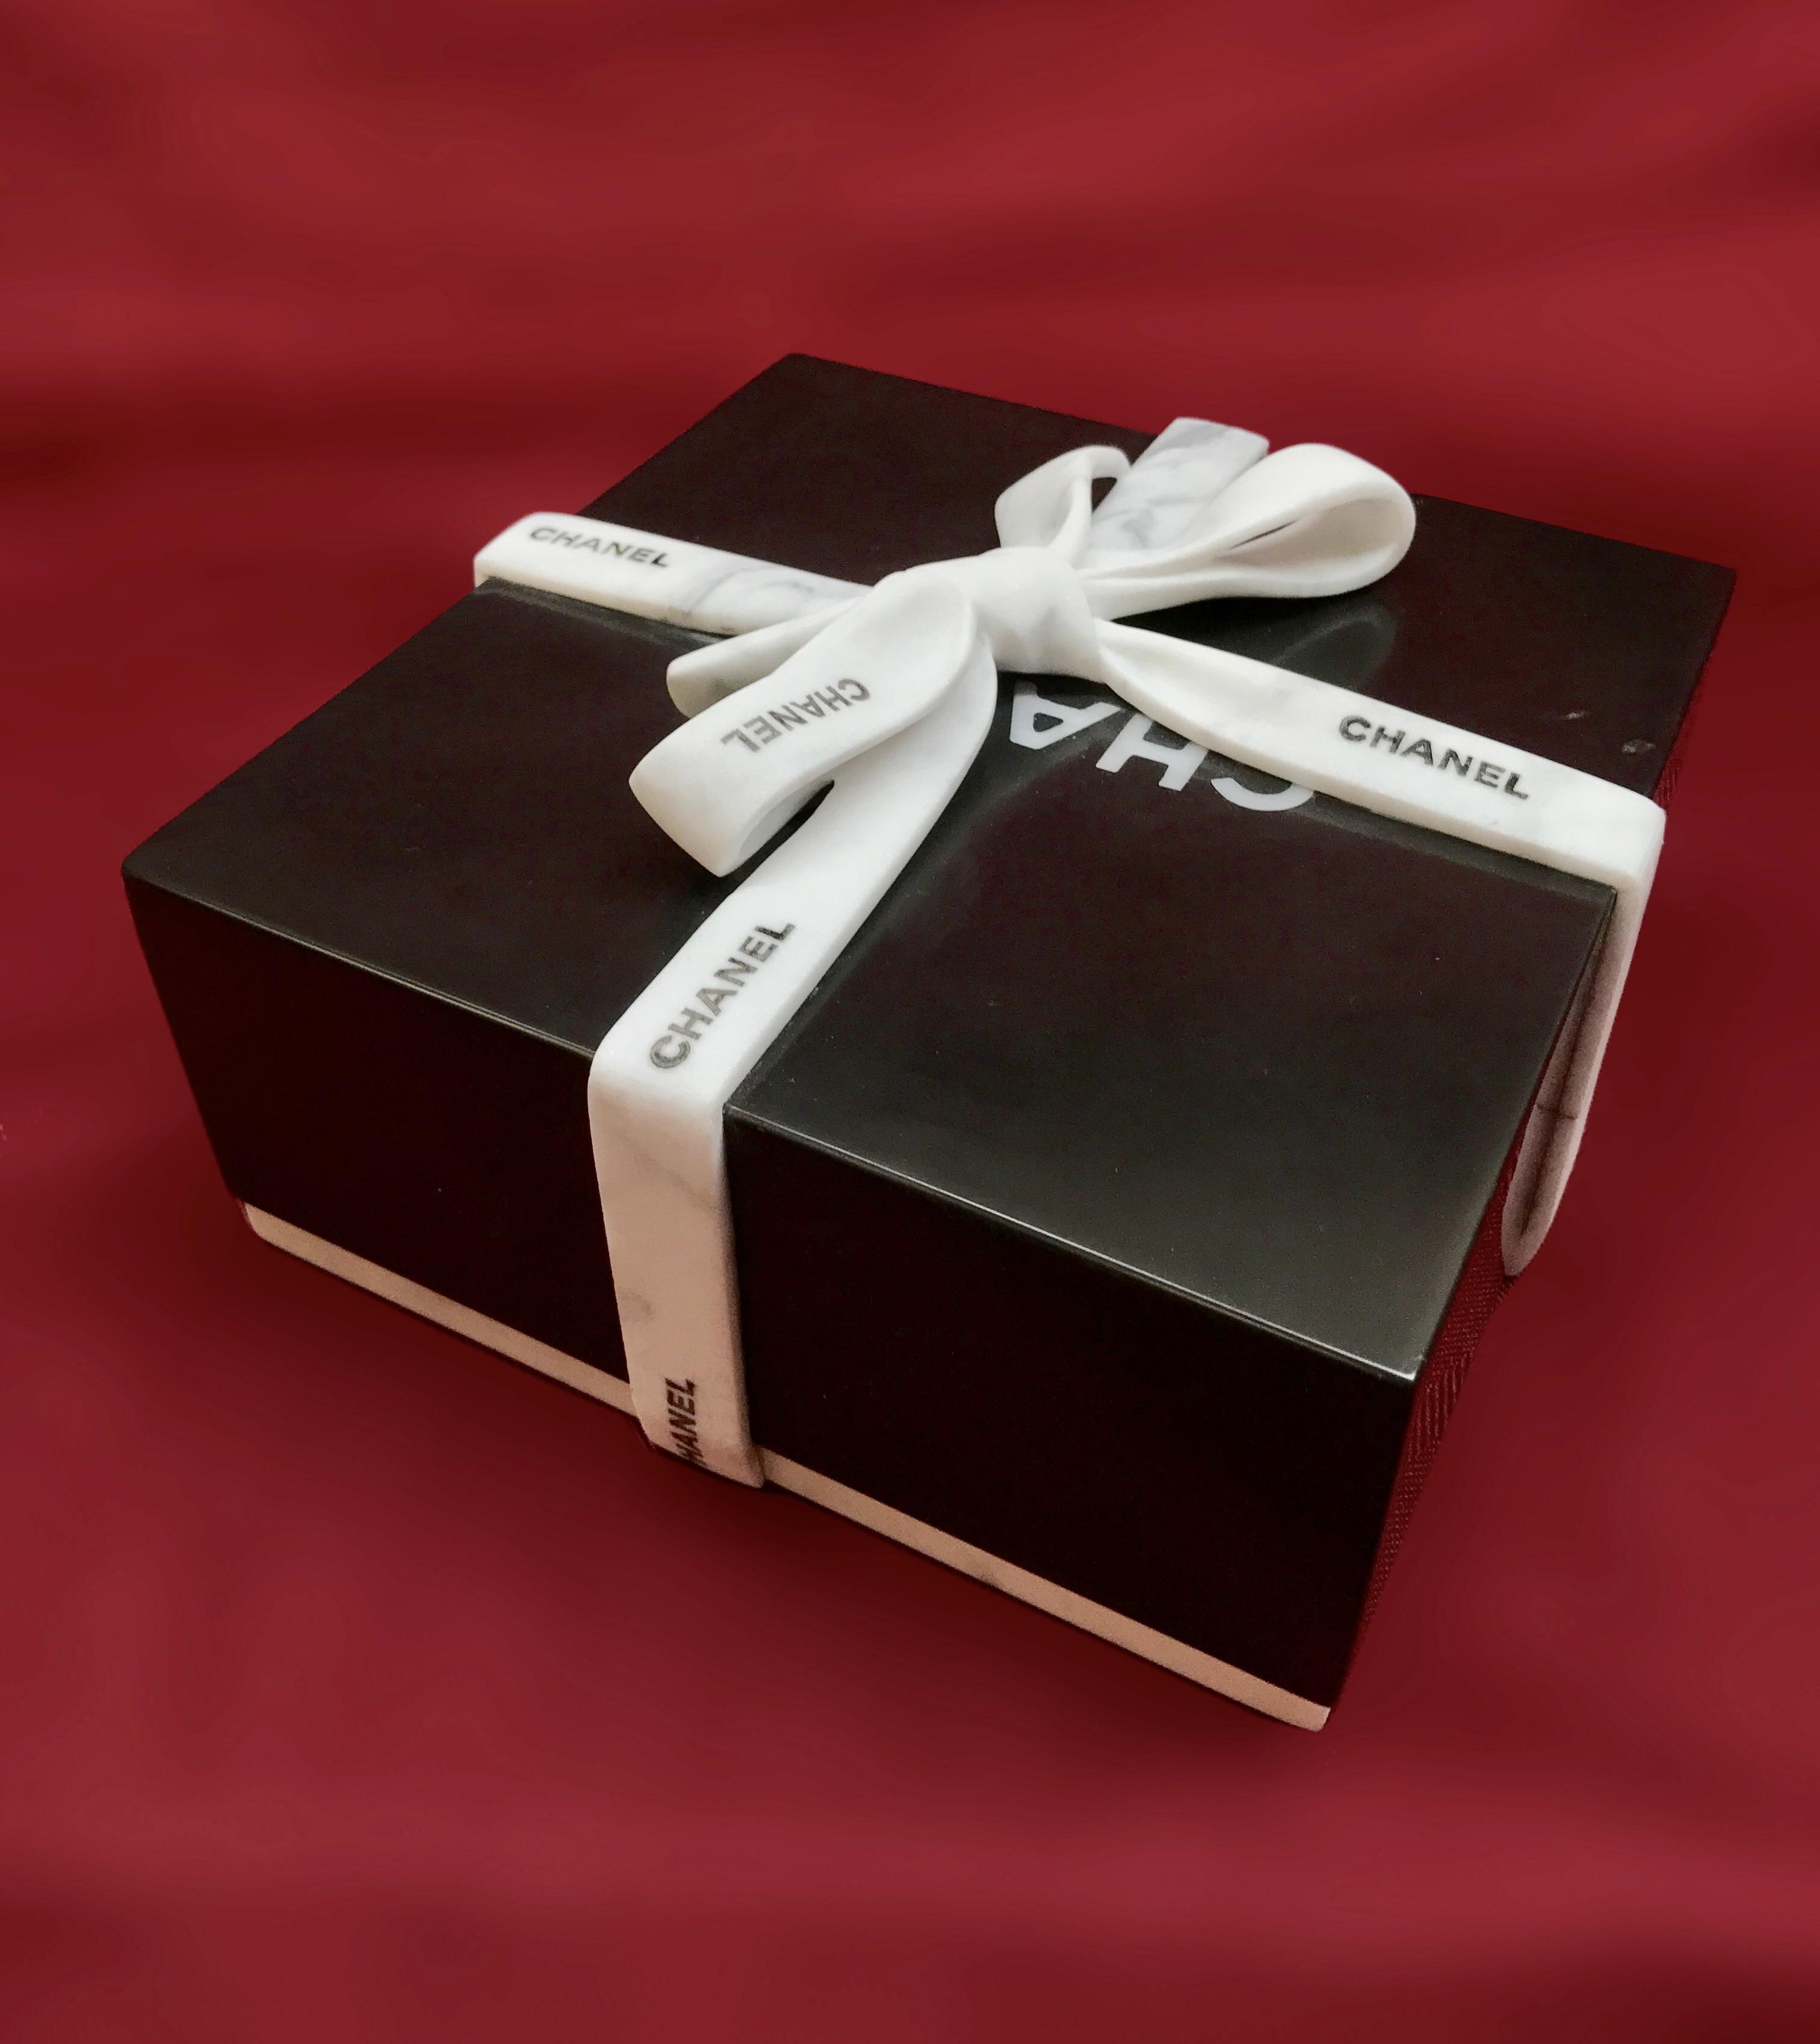 """Chanel Gift Box"""